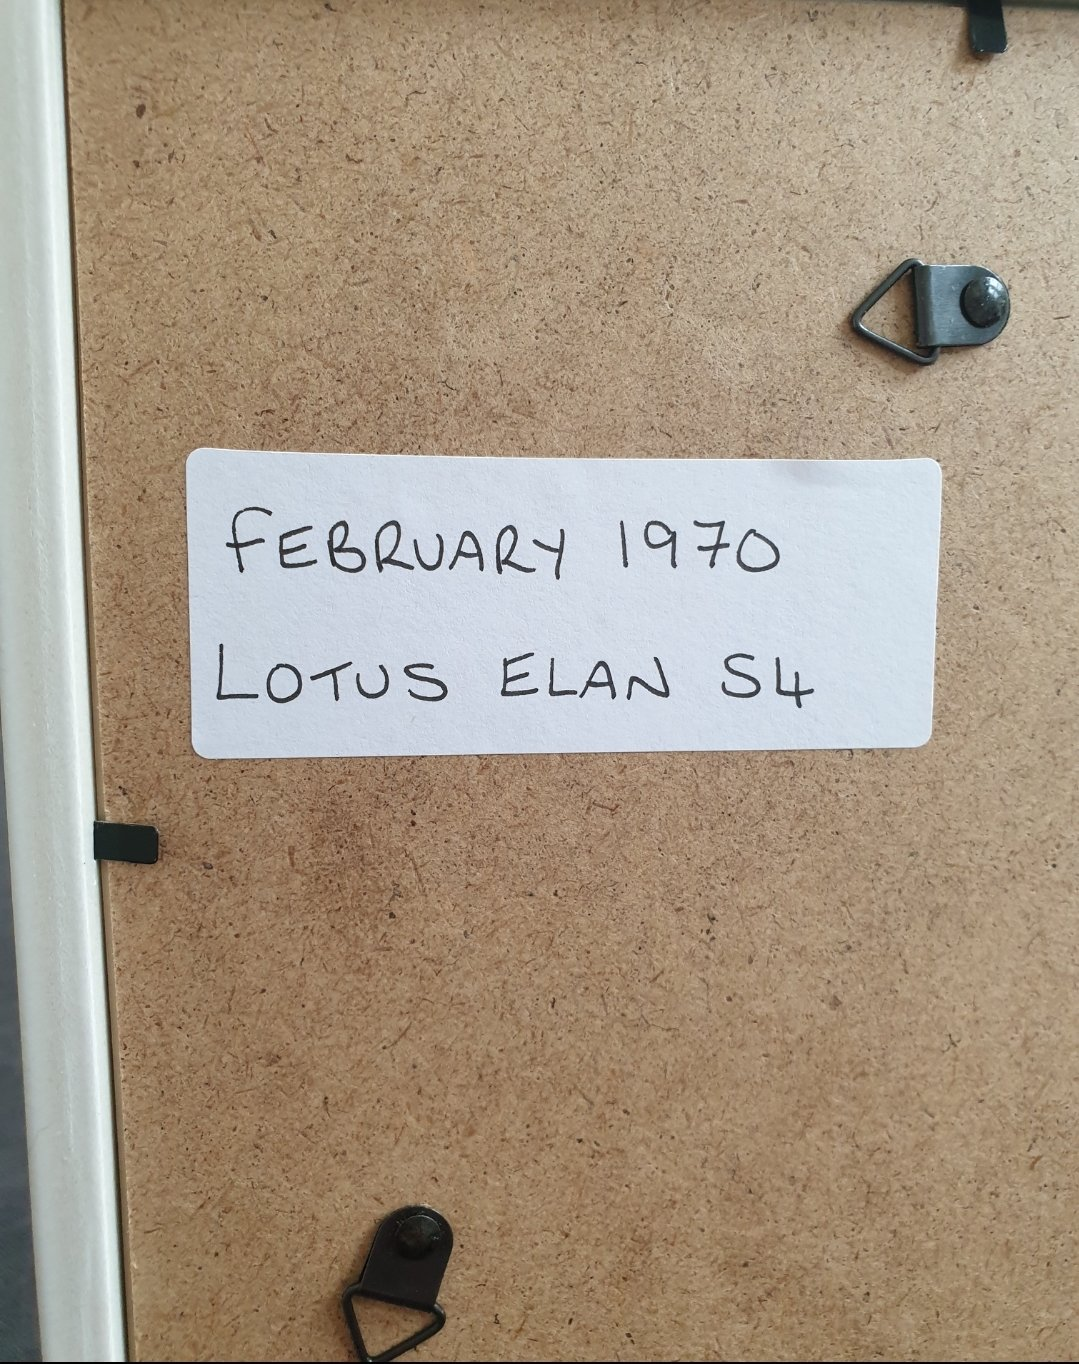 Original 1970 Lotus Elan S4 Framed Advert For Sale (picture 2 of 2)